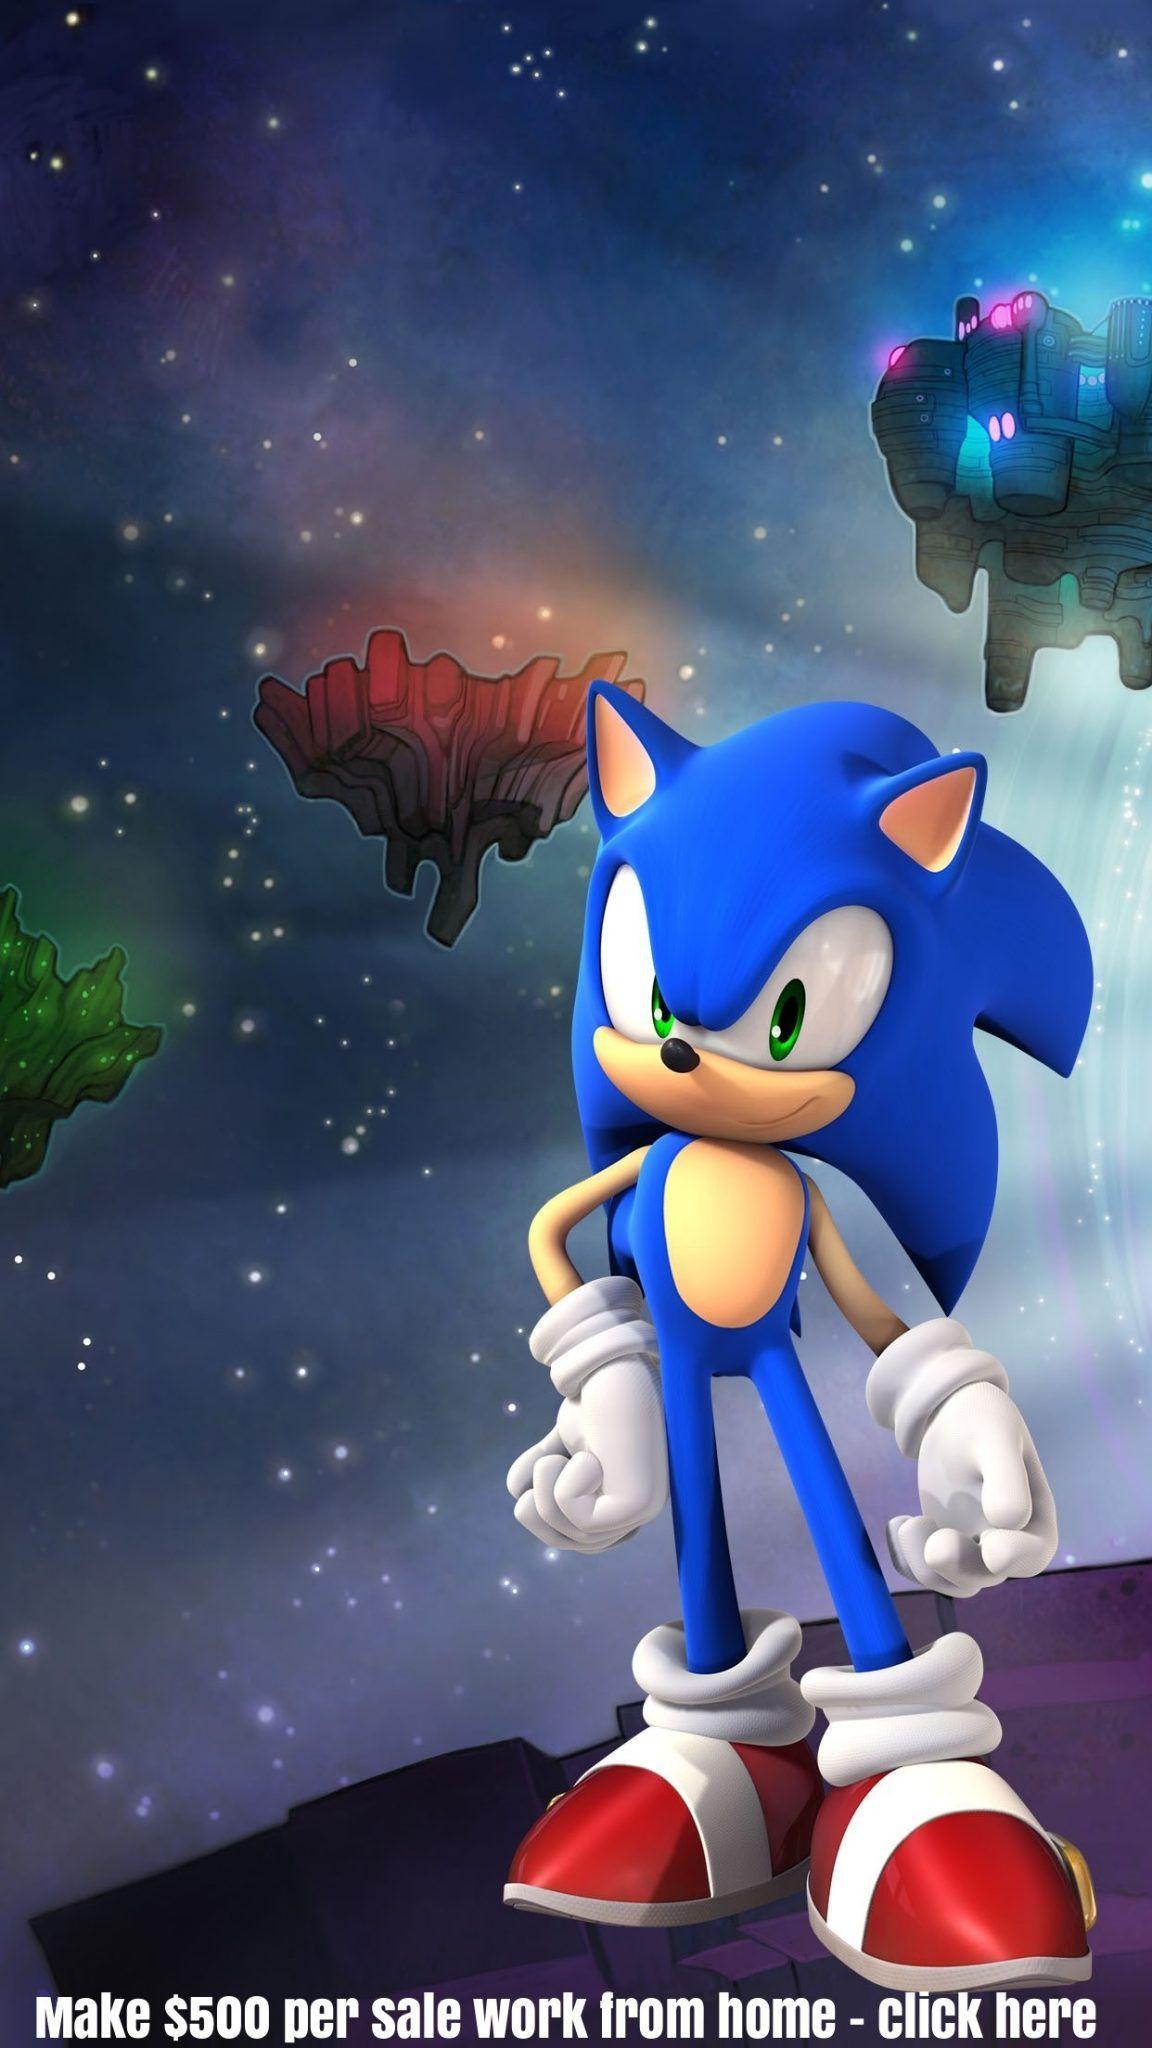 Sonic The Hedgehog Iphone Wallpaper 64 Images regarding